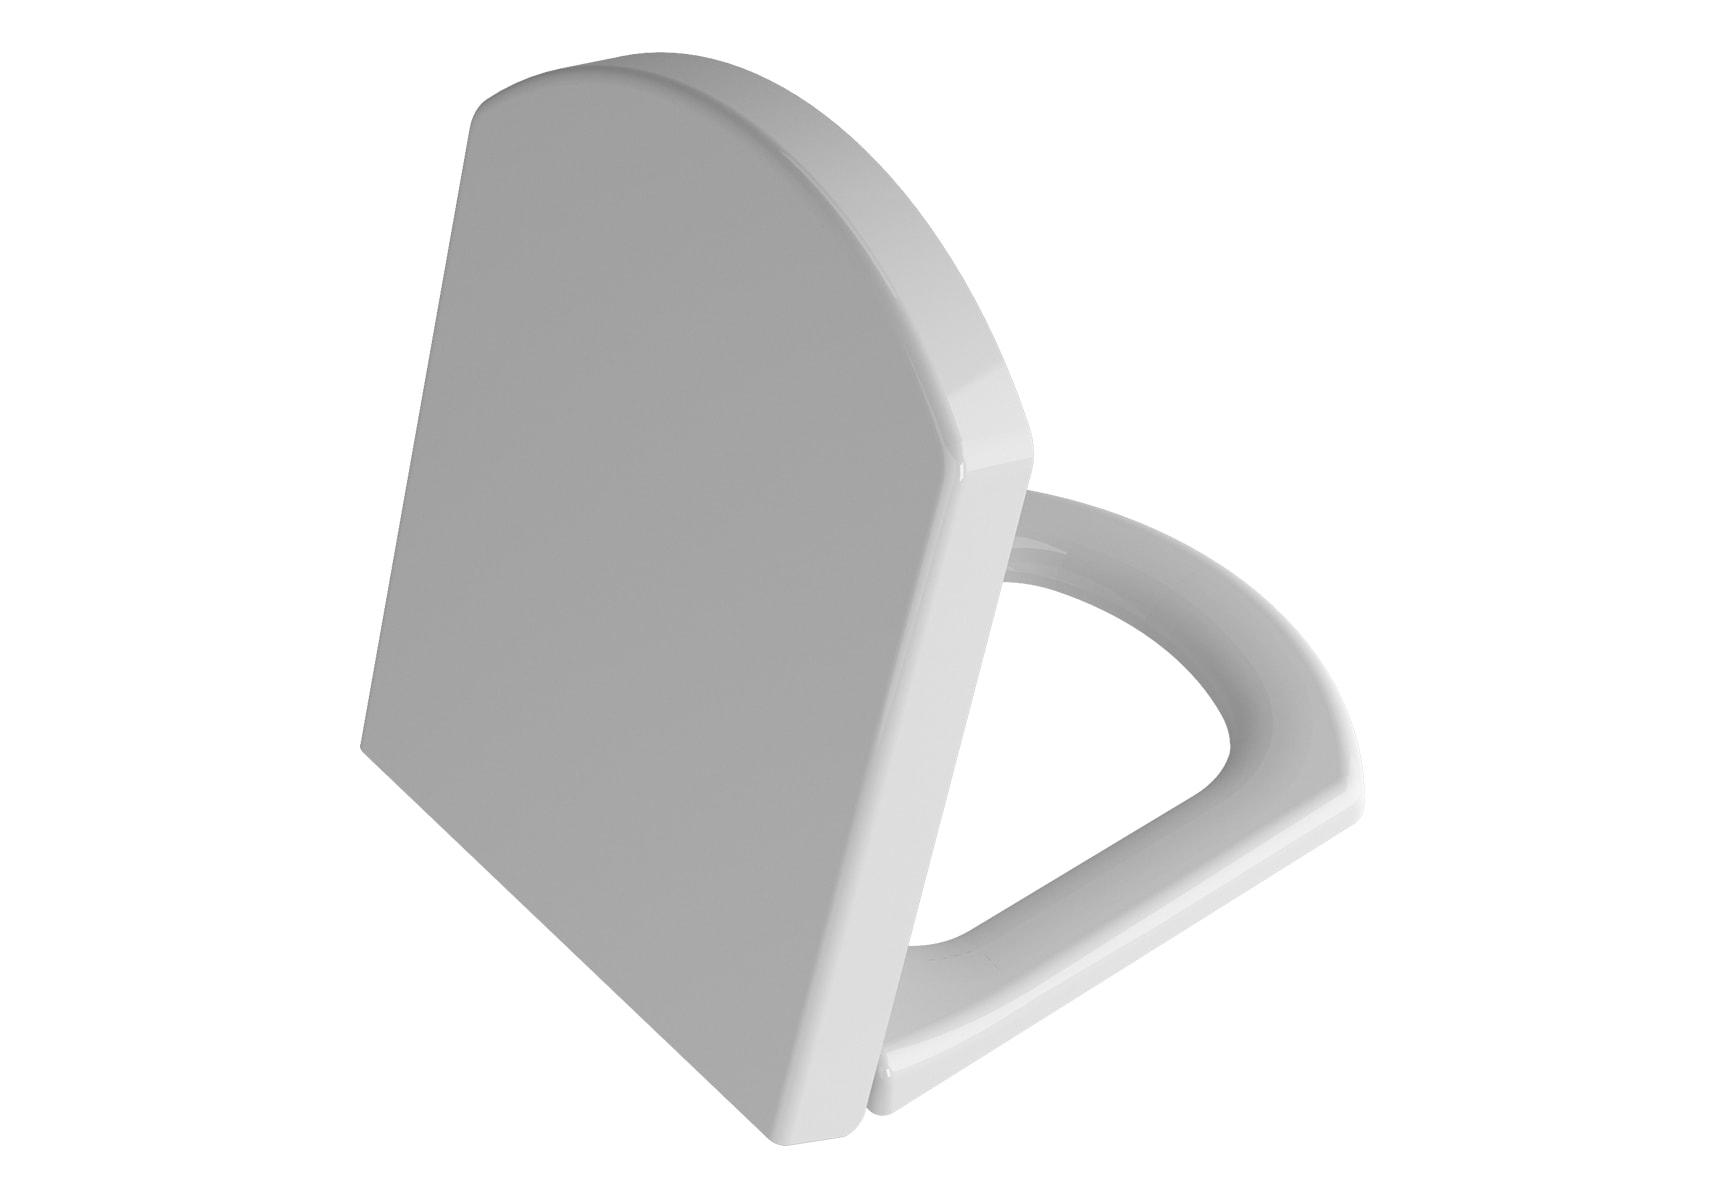 Nuova WC Seat Duroplast